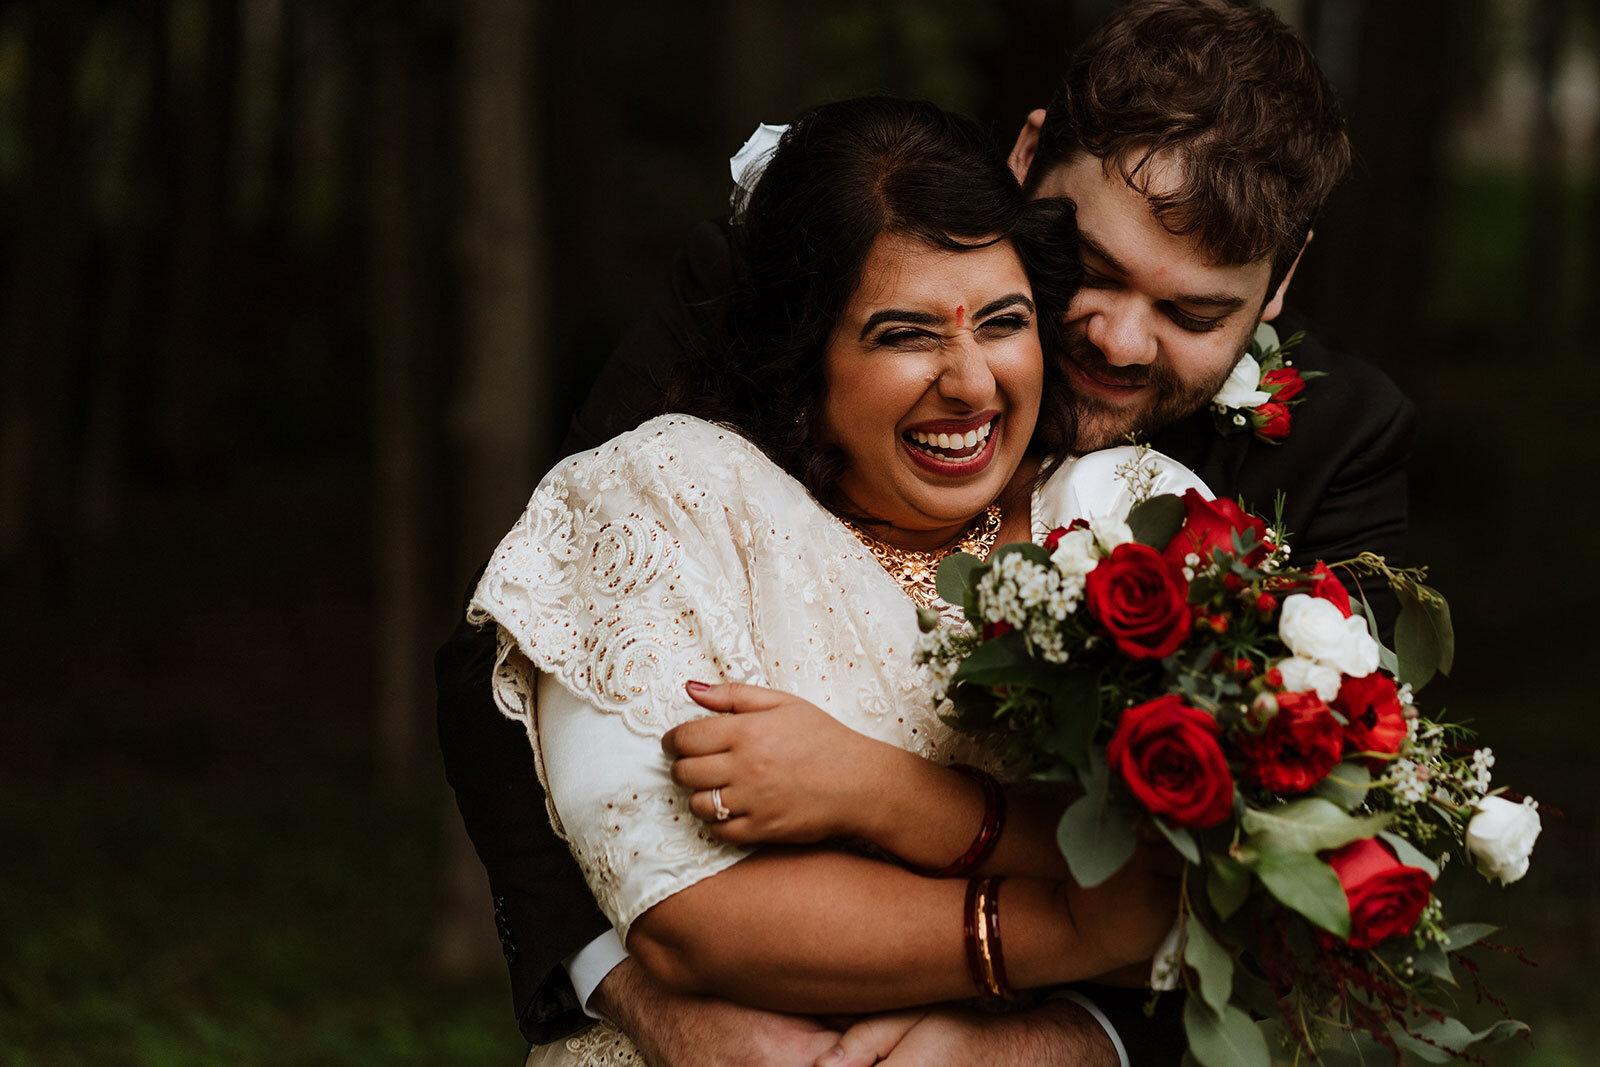 Newlywed couple hug and smile after wedding Rachel Epperly Film and Photo Portland Oregon